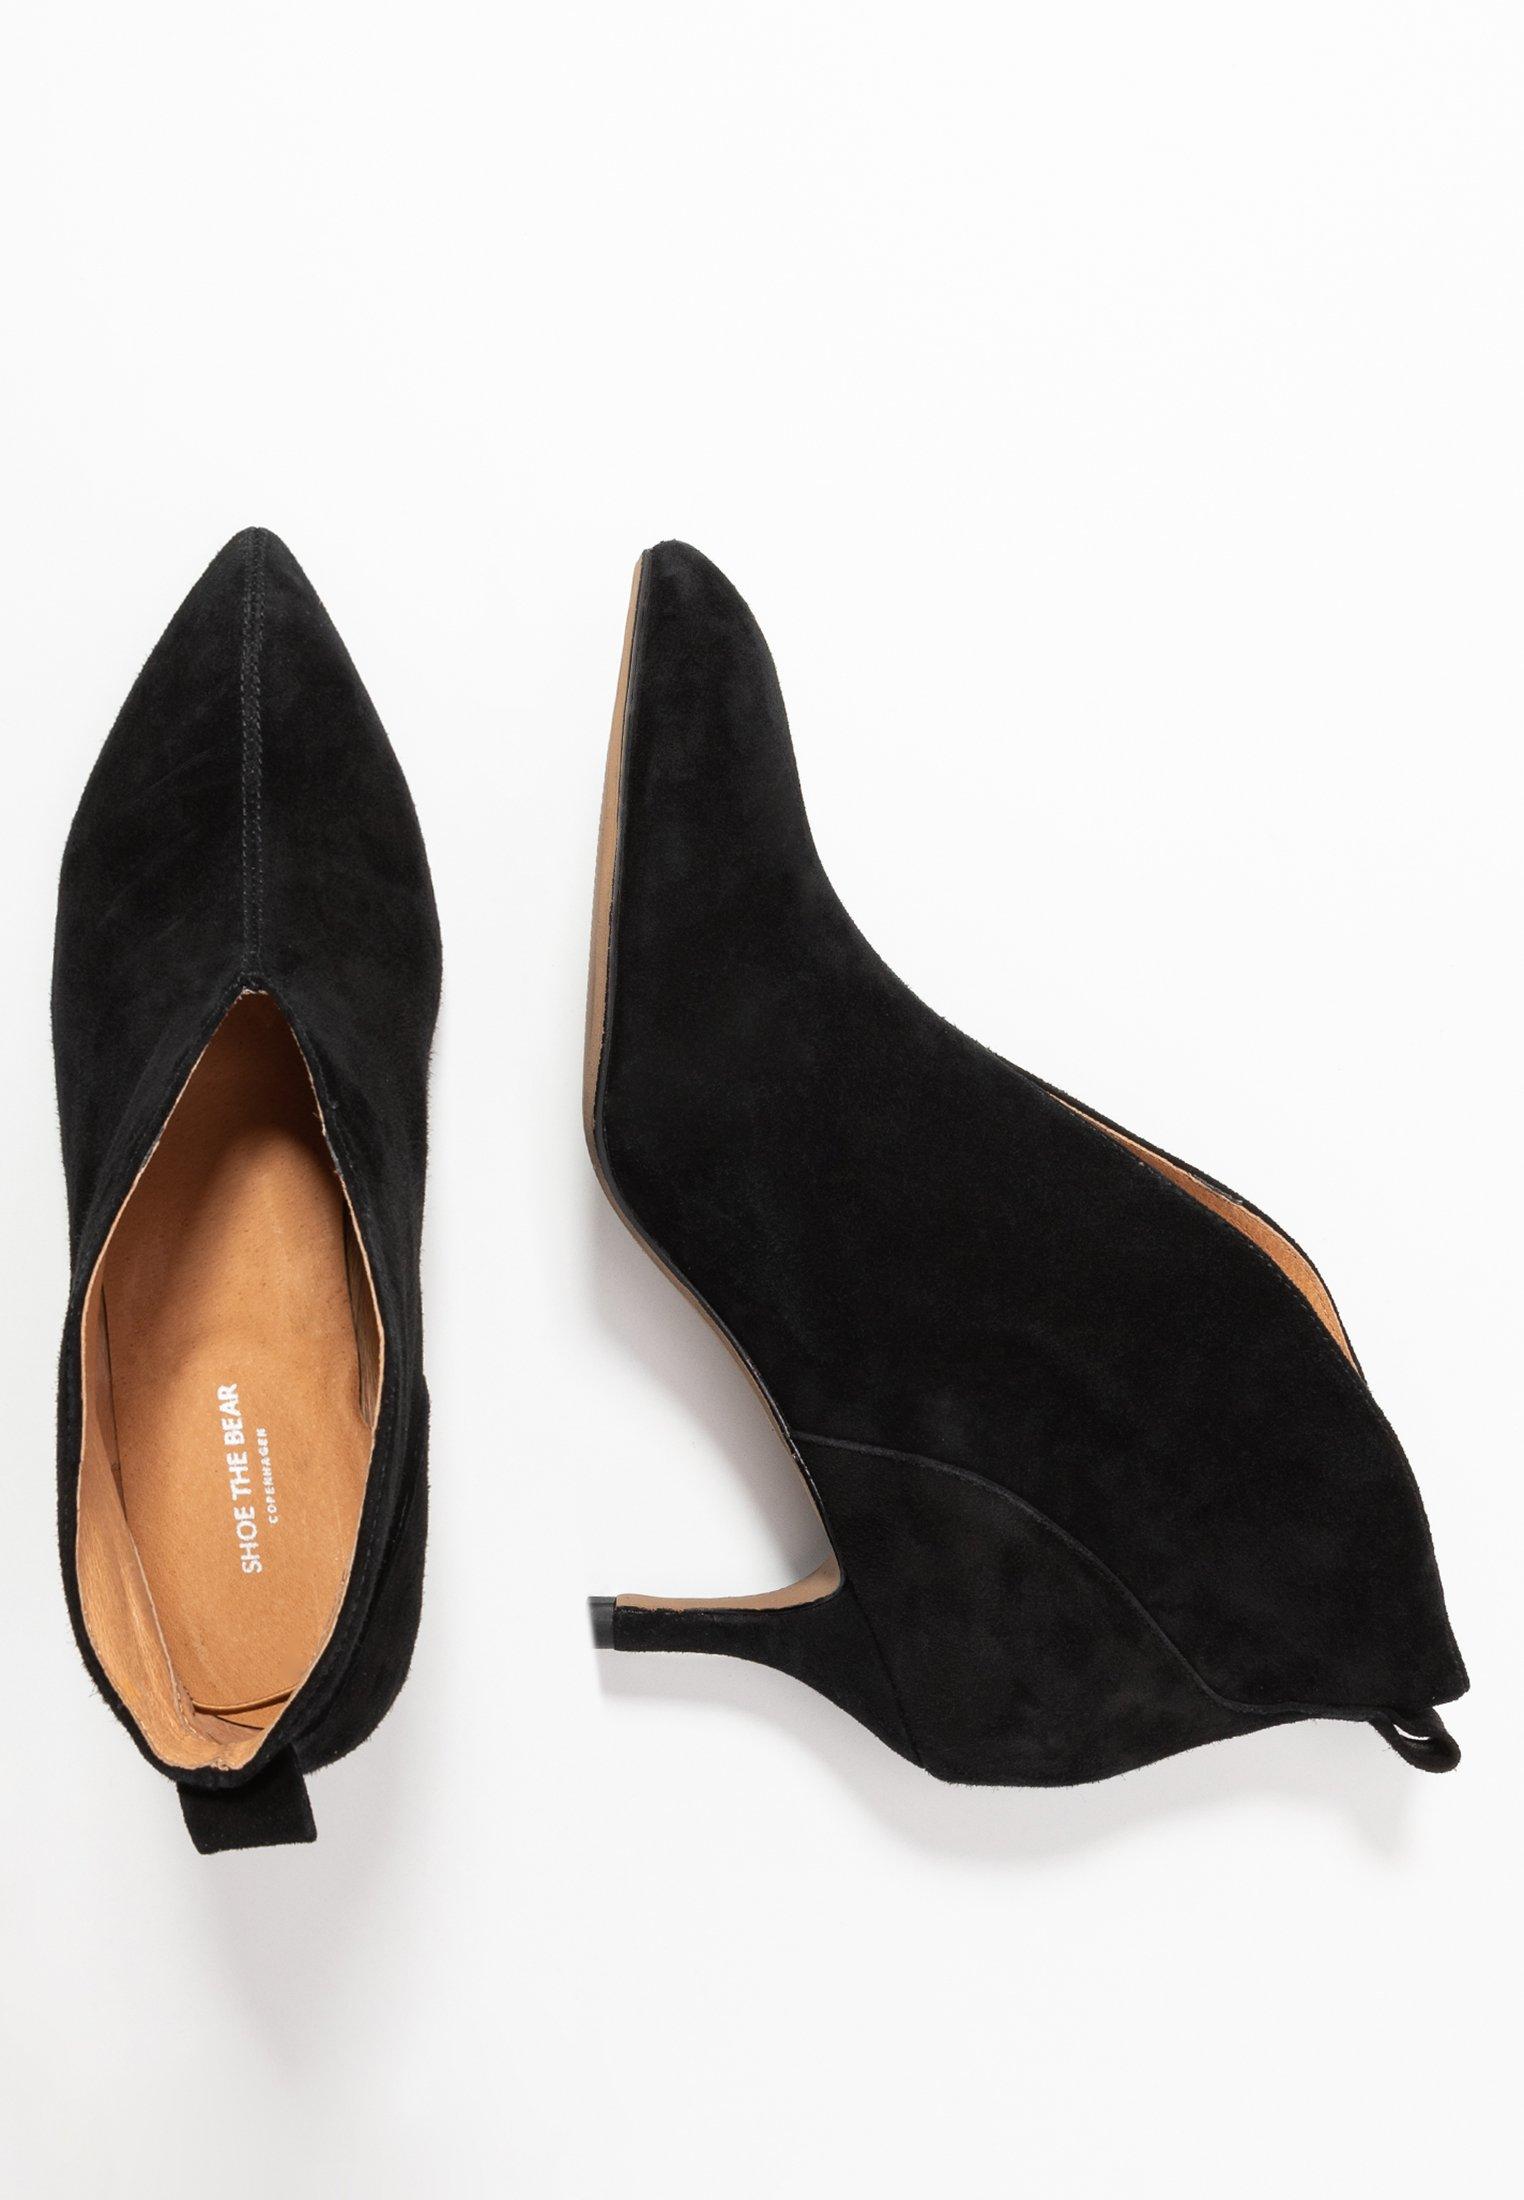 Shoe The Bear Valentine - Ankelboots Black